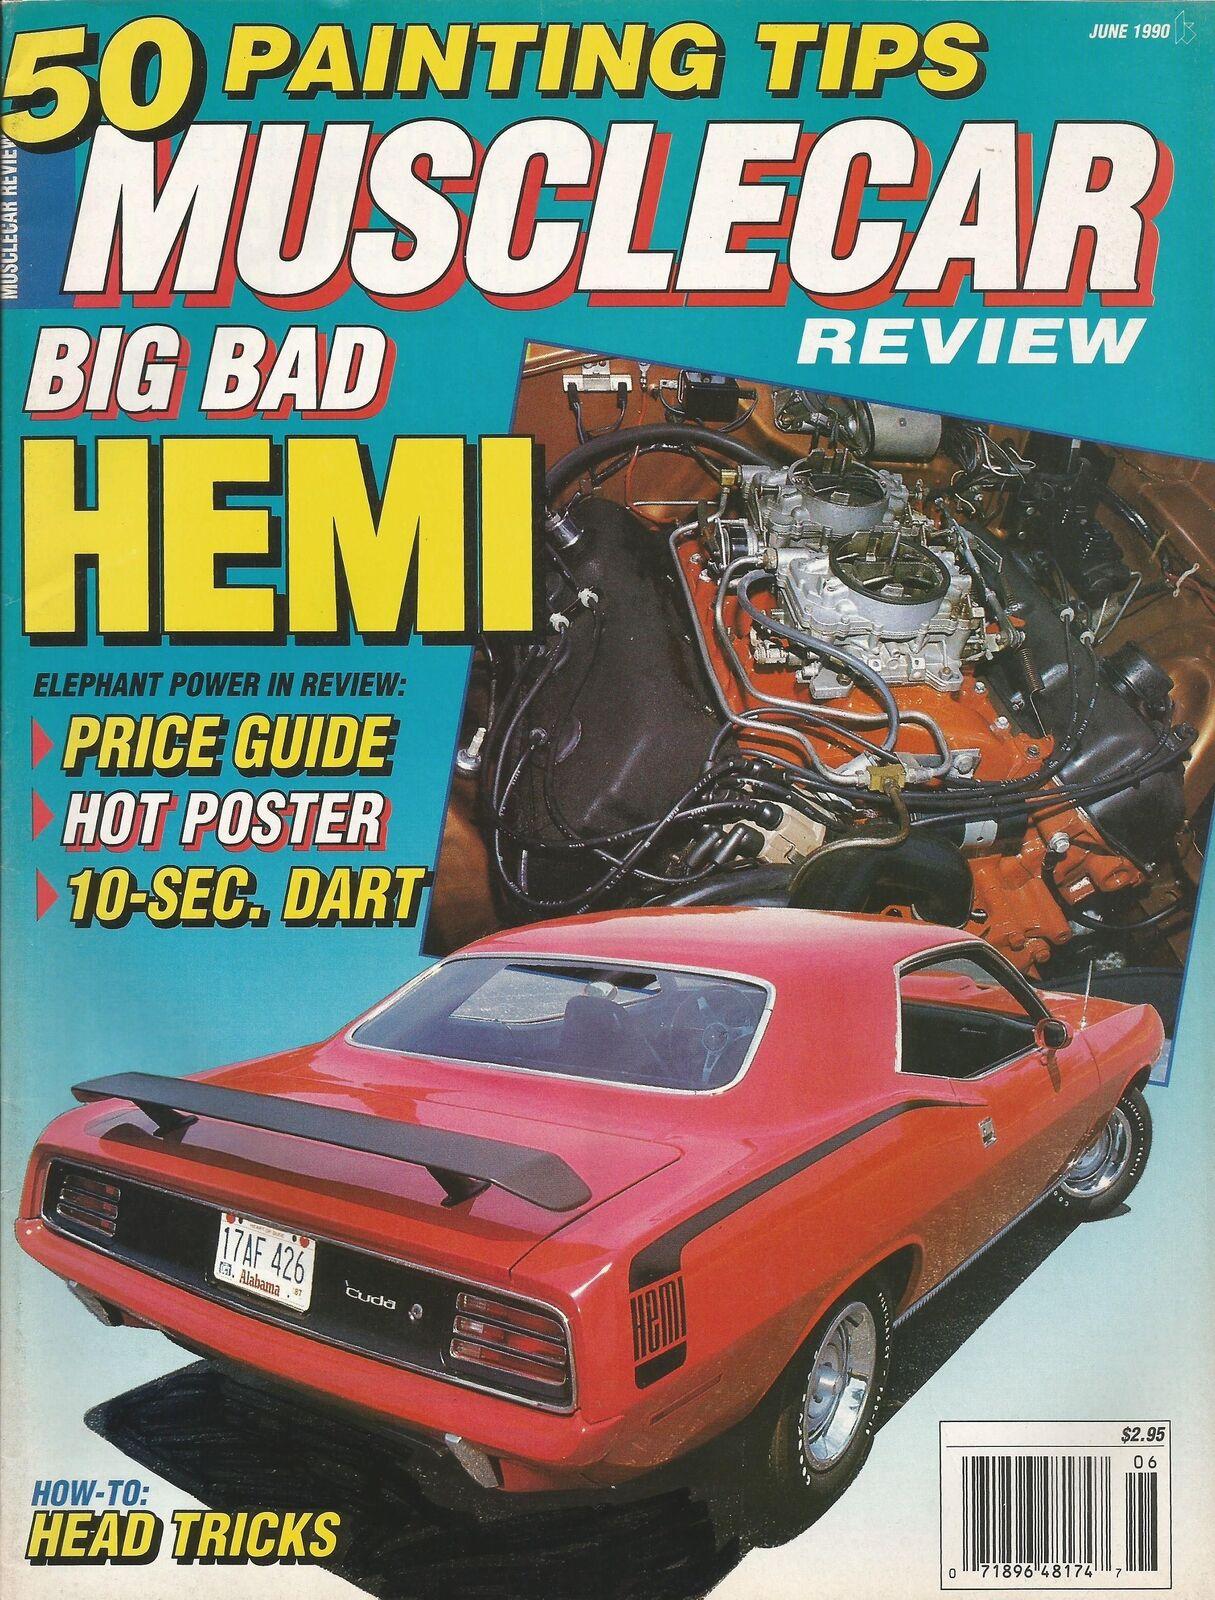 Muscle Car Review 1987 Dec - FE Gs80 HEMI Cuda W30 | eBay